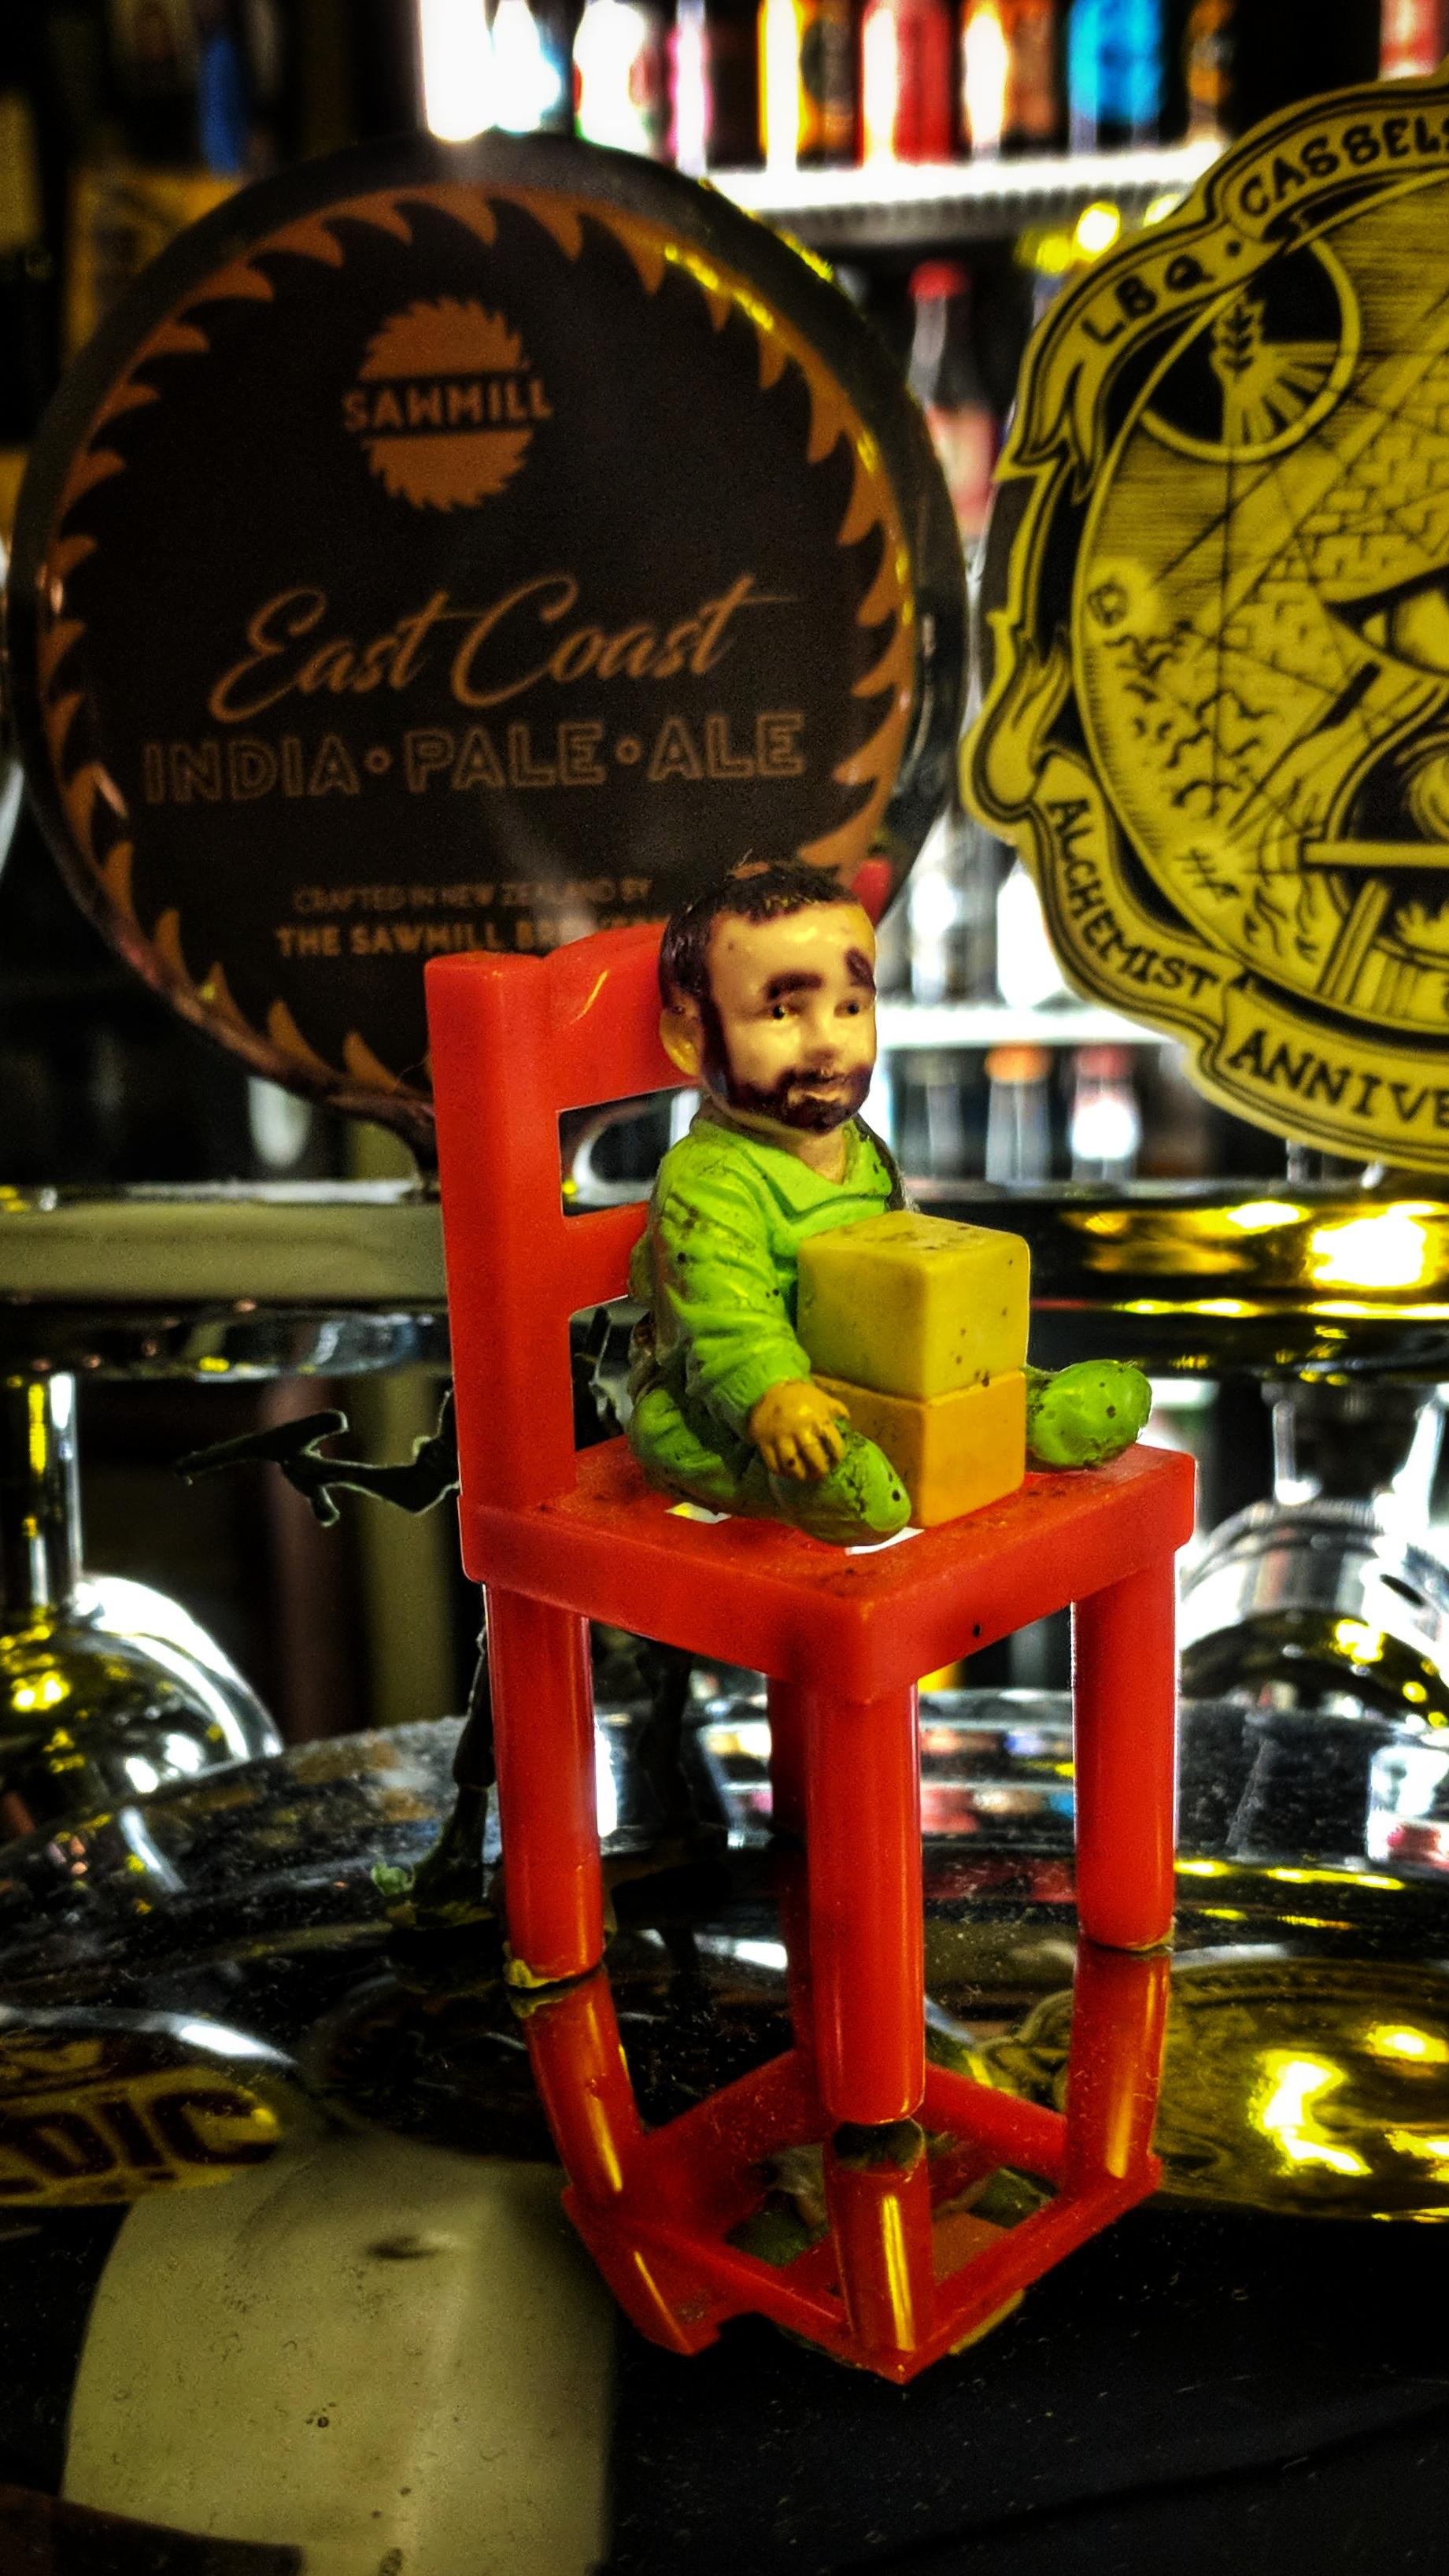 A figurine on the bar - caption that